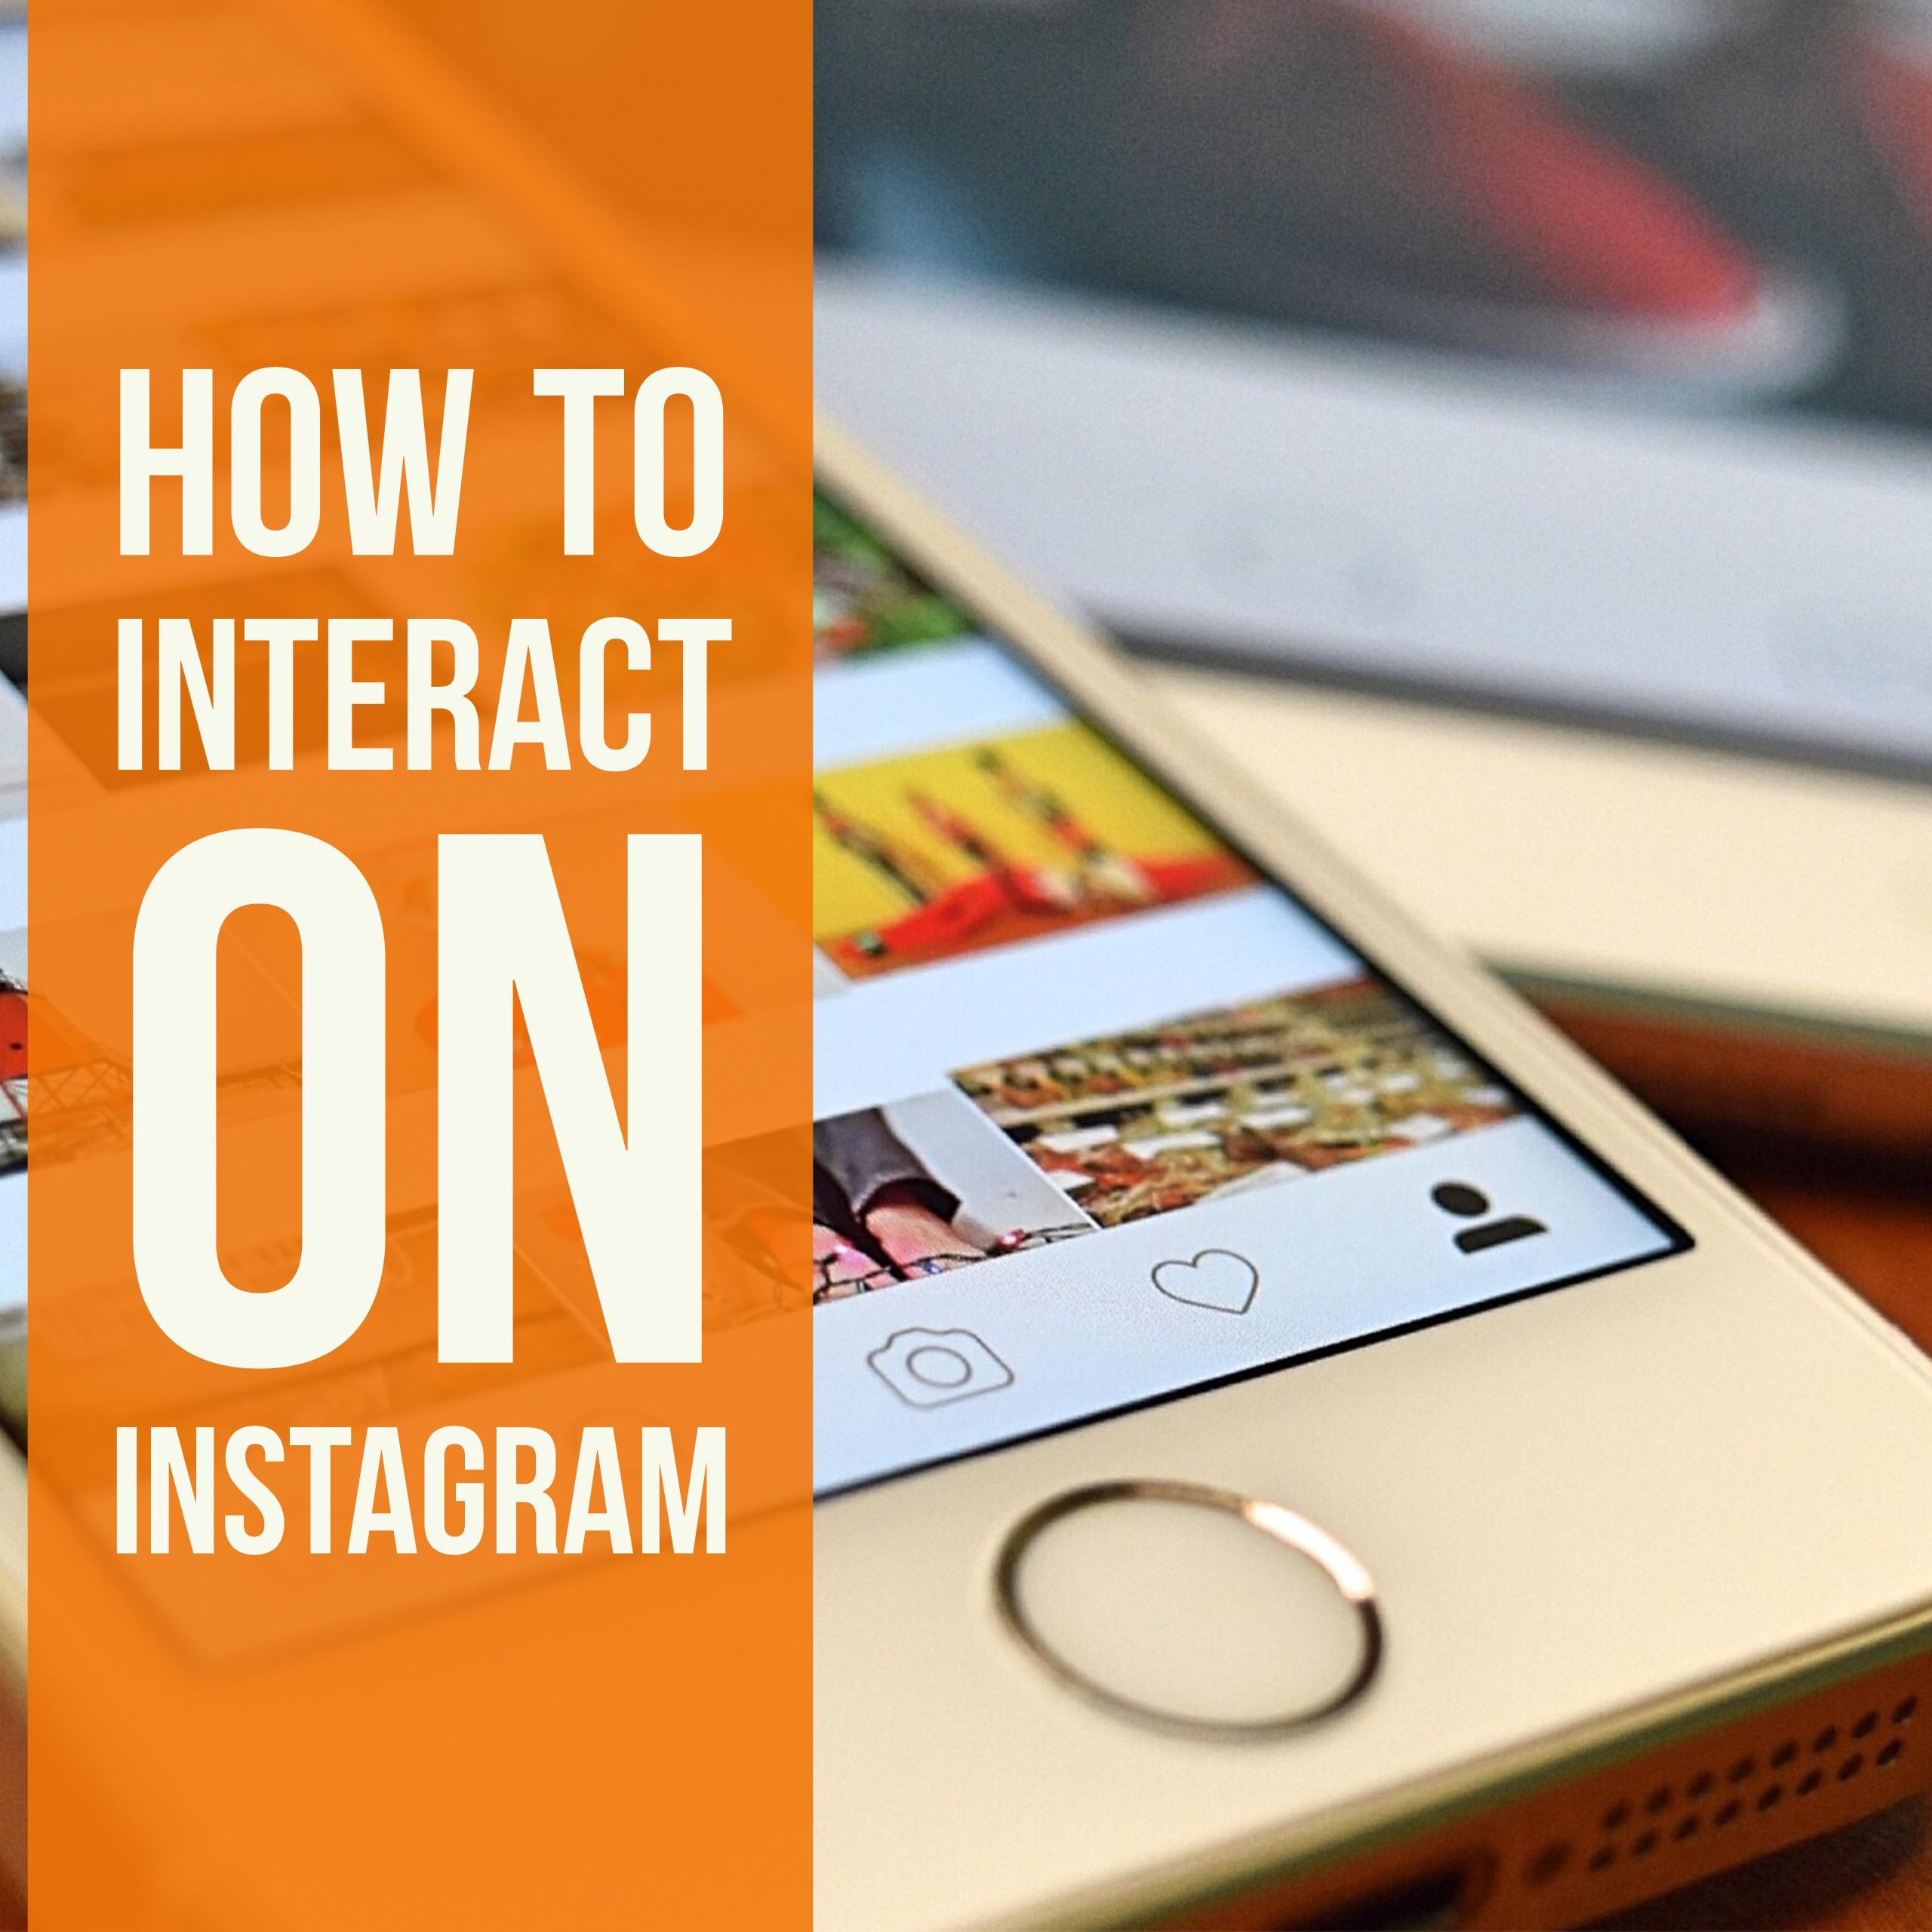 interacting on instagram